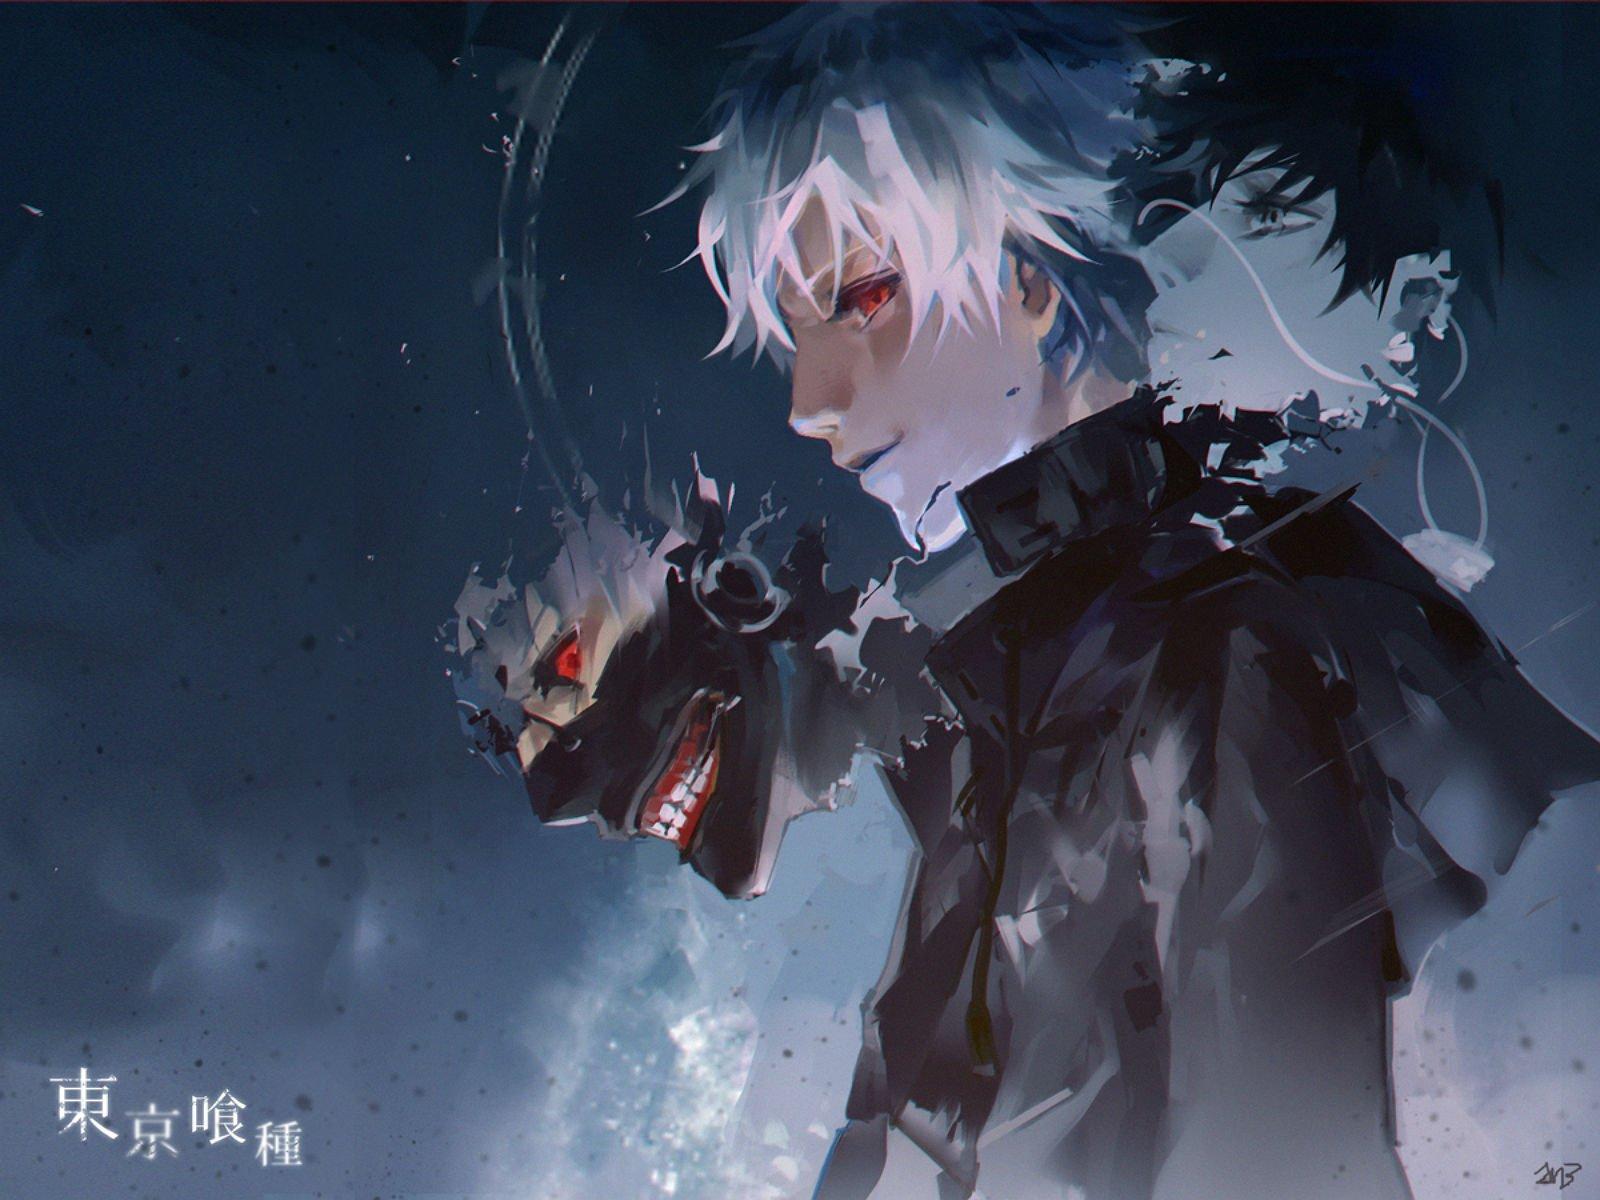 anh wallpaperup anime 4 jpg